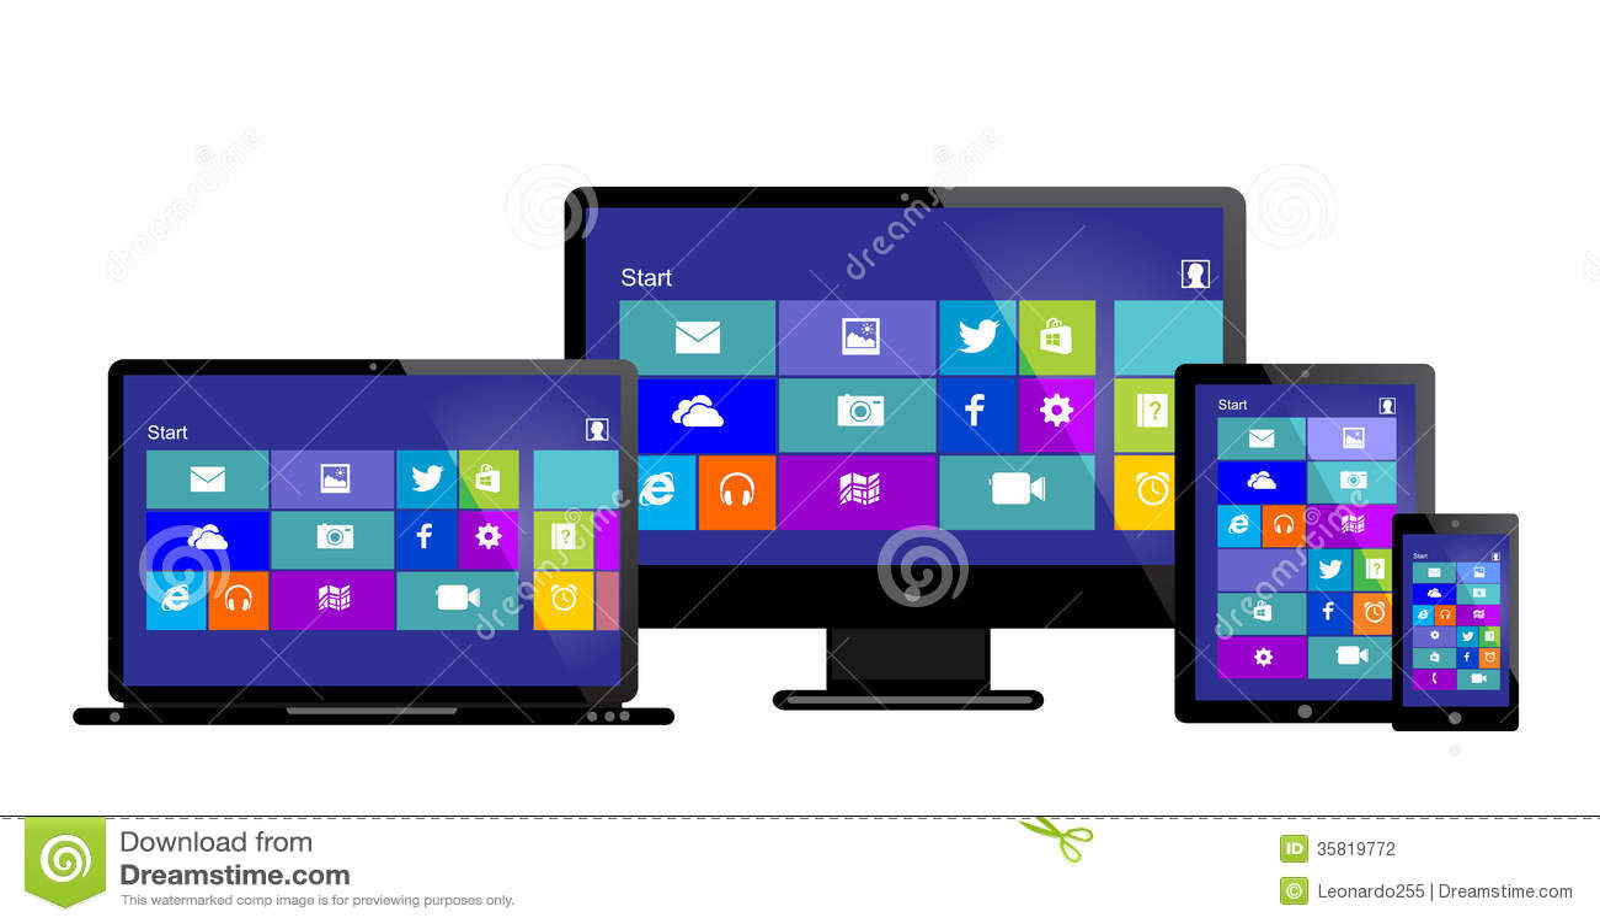 Windows 8 computer - Editorial Stock Photo